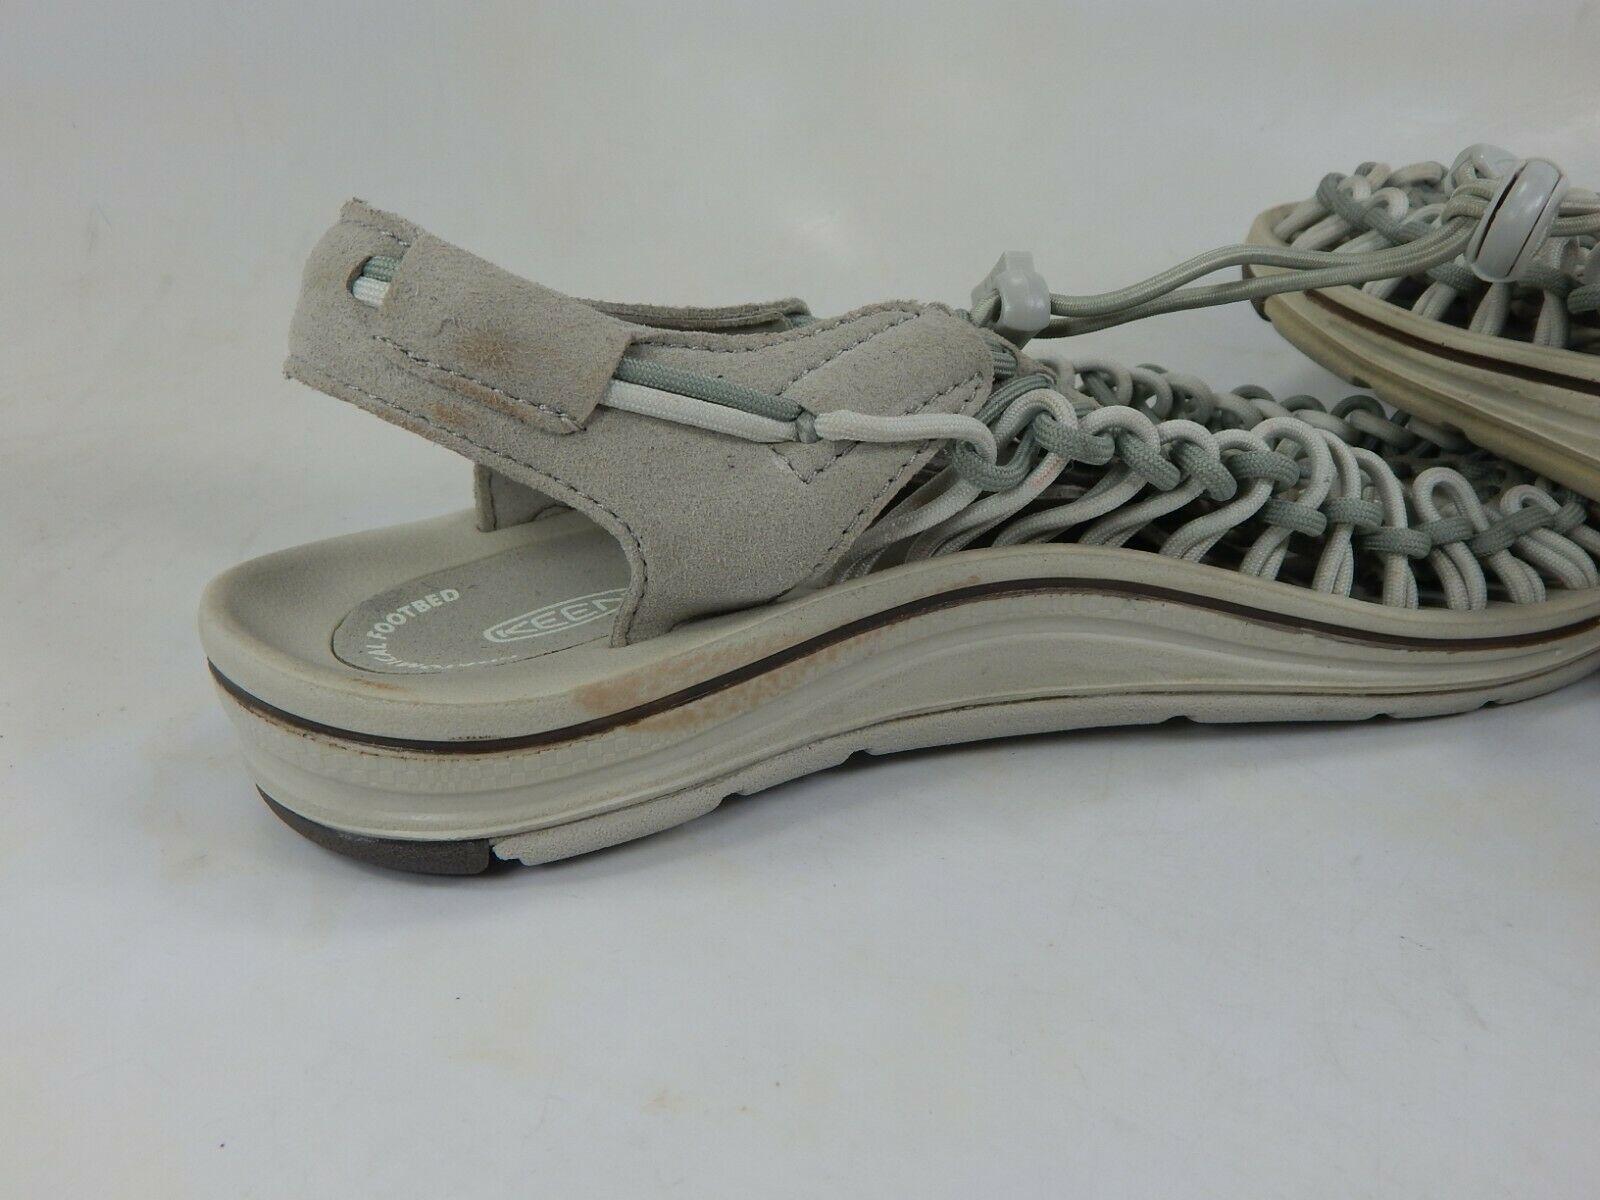 Keen Uneek Size 7 M (B) EU 37.5 Women's Sport Sandals Shoes London Fog